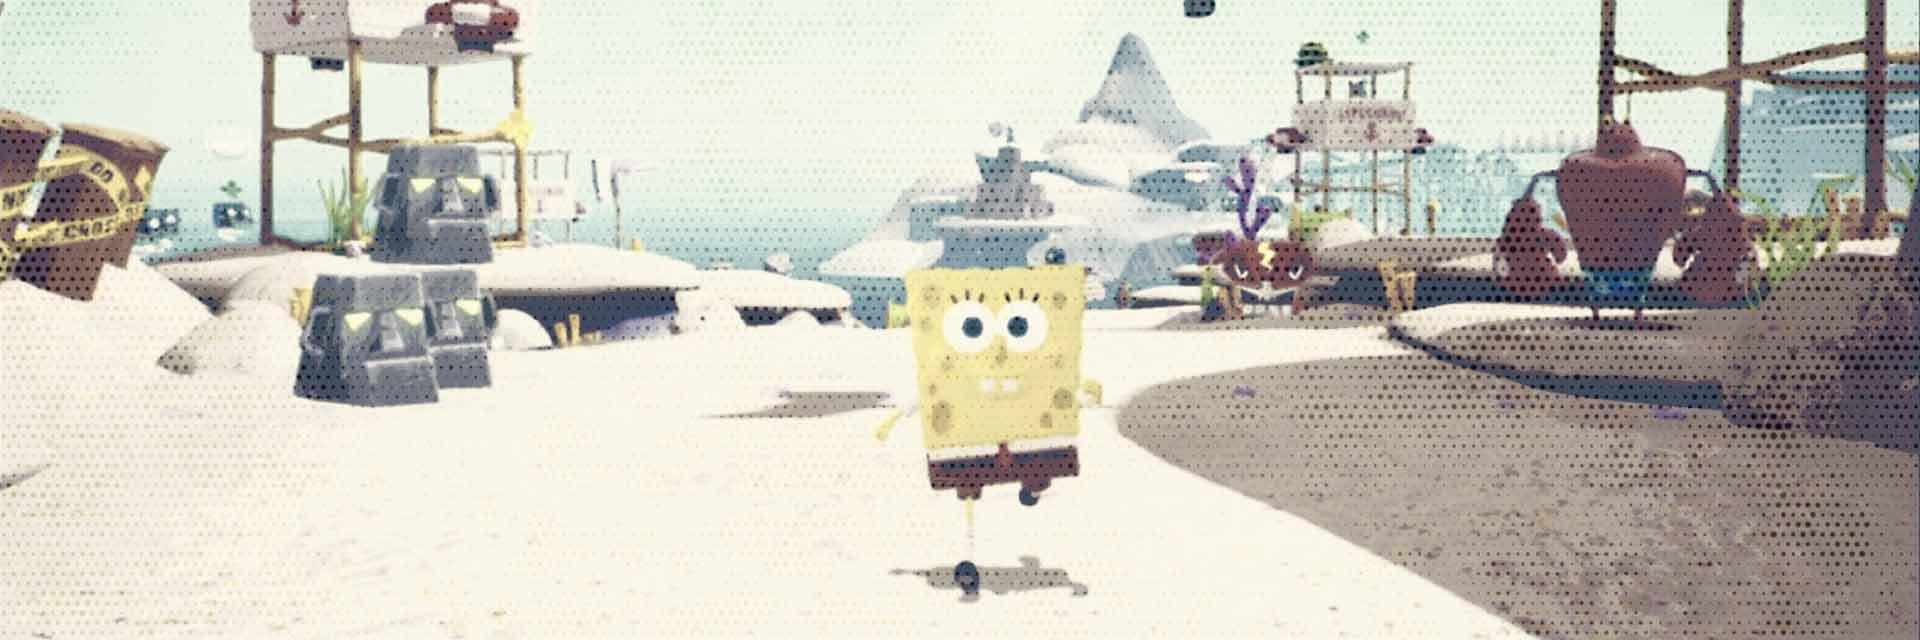 spongebob squarepants battle for bikini bottom rehydrated scheda gioco